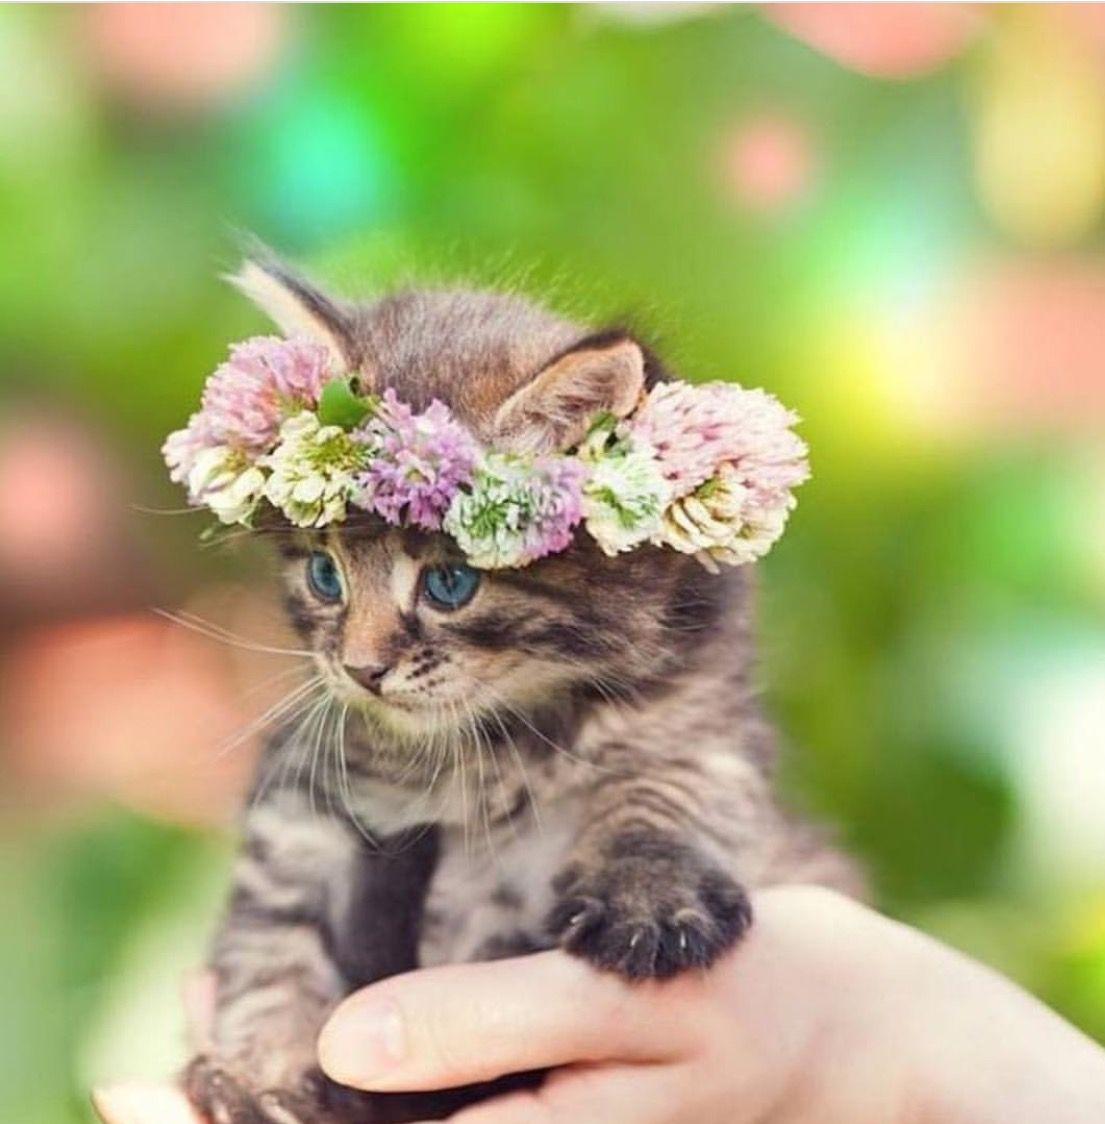 Ahh This Is Such A Precious Pic So Adorable Cute Animals Kittens Cutest Kittens